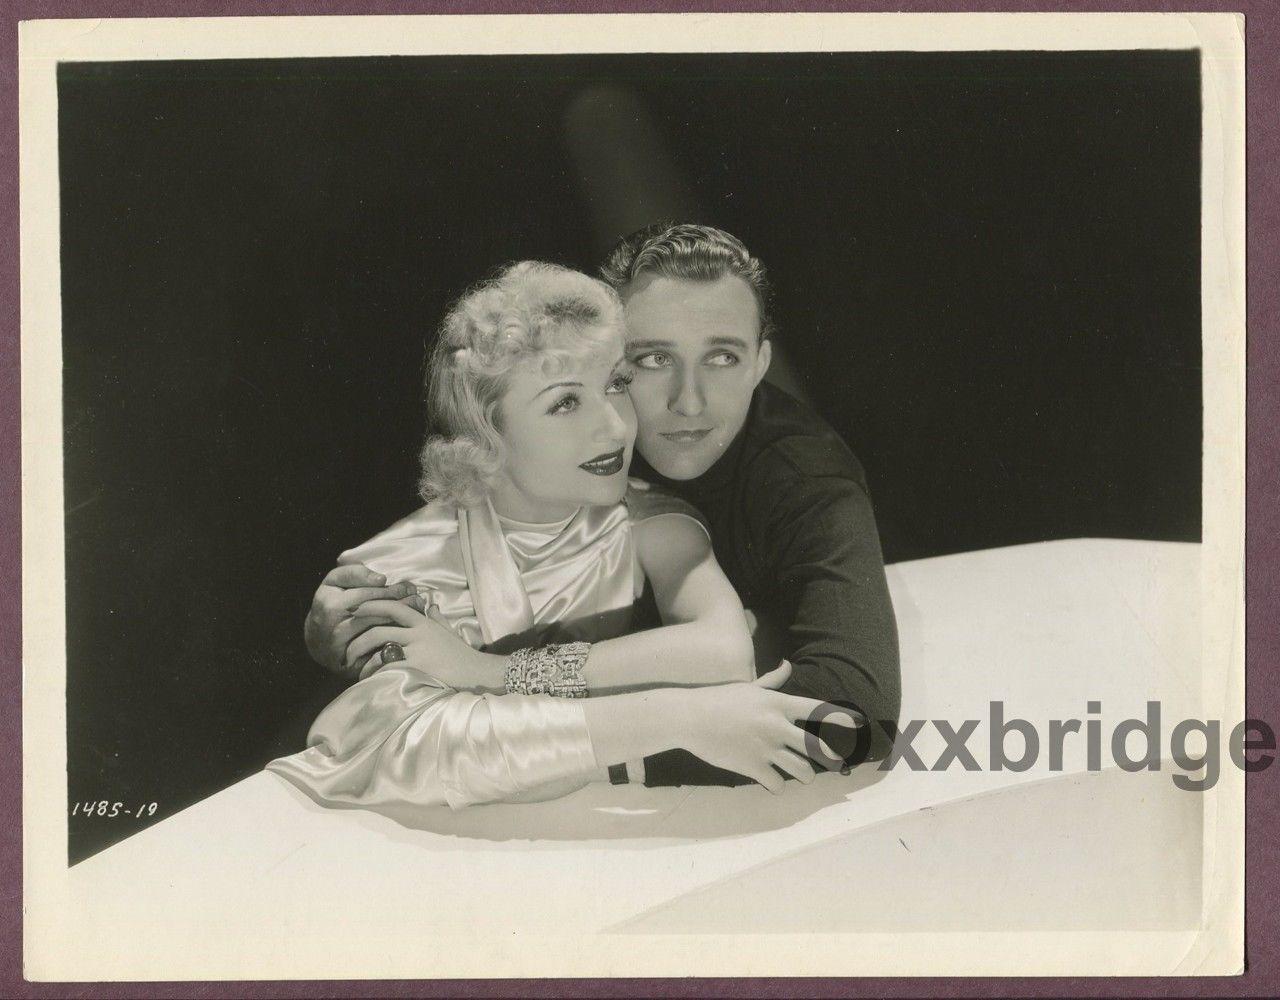 CAROLE LOMBARD Bing Crosby Splendid Romantic Embrace 1934 ORIGINAL Glamour Photo   eBay